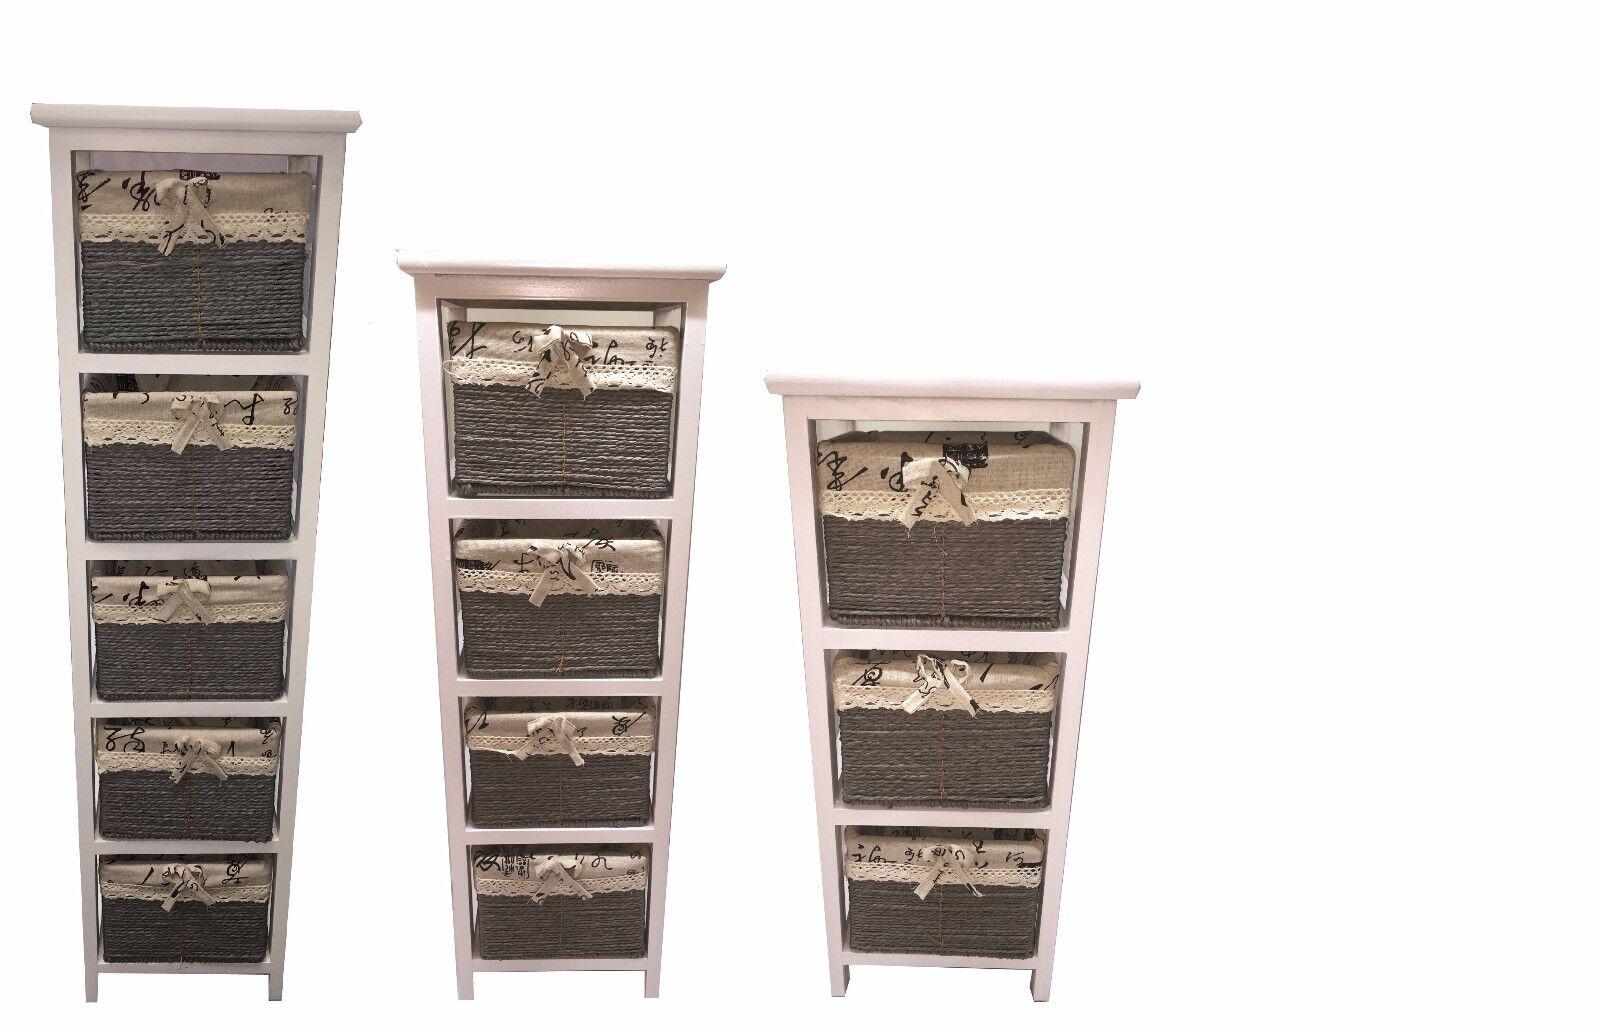 New Slim 3 4 5 Drawer Maize Basket White Wood Cabinet Storage Organiser Bathroom